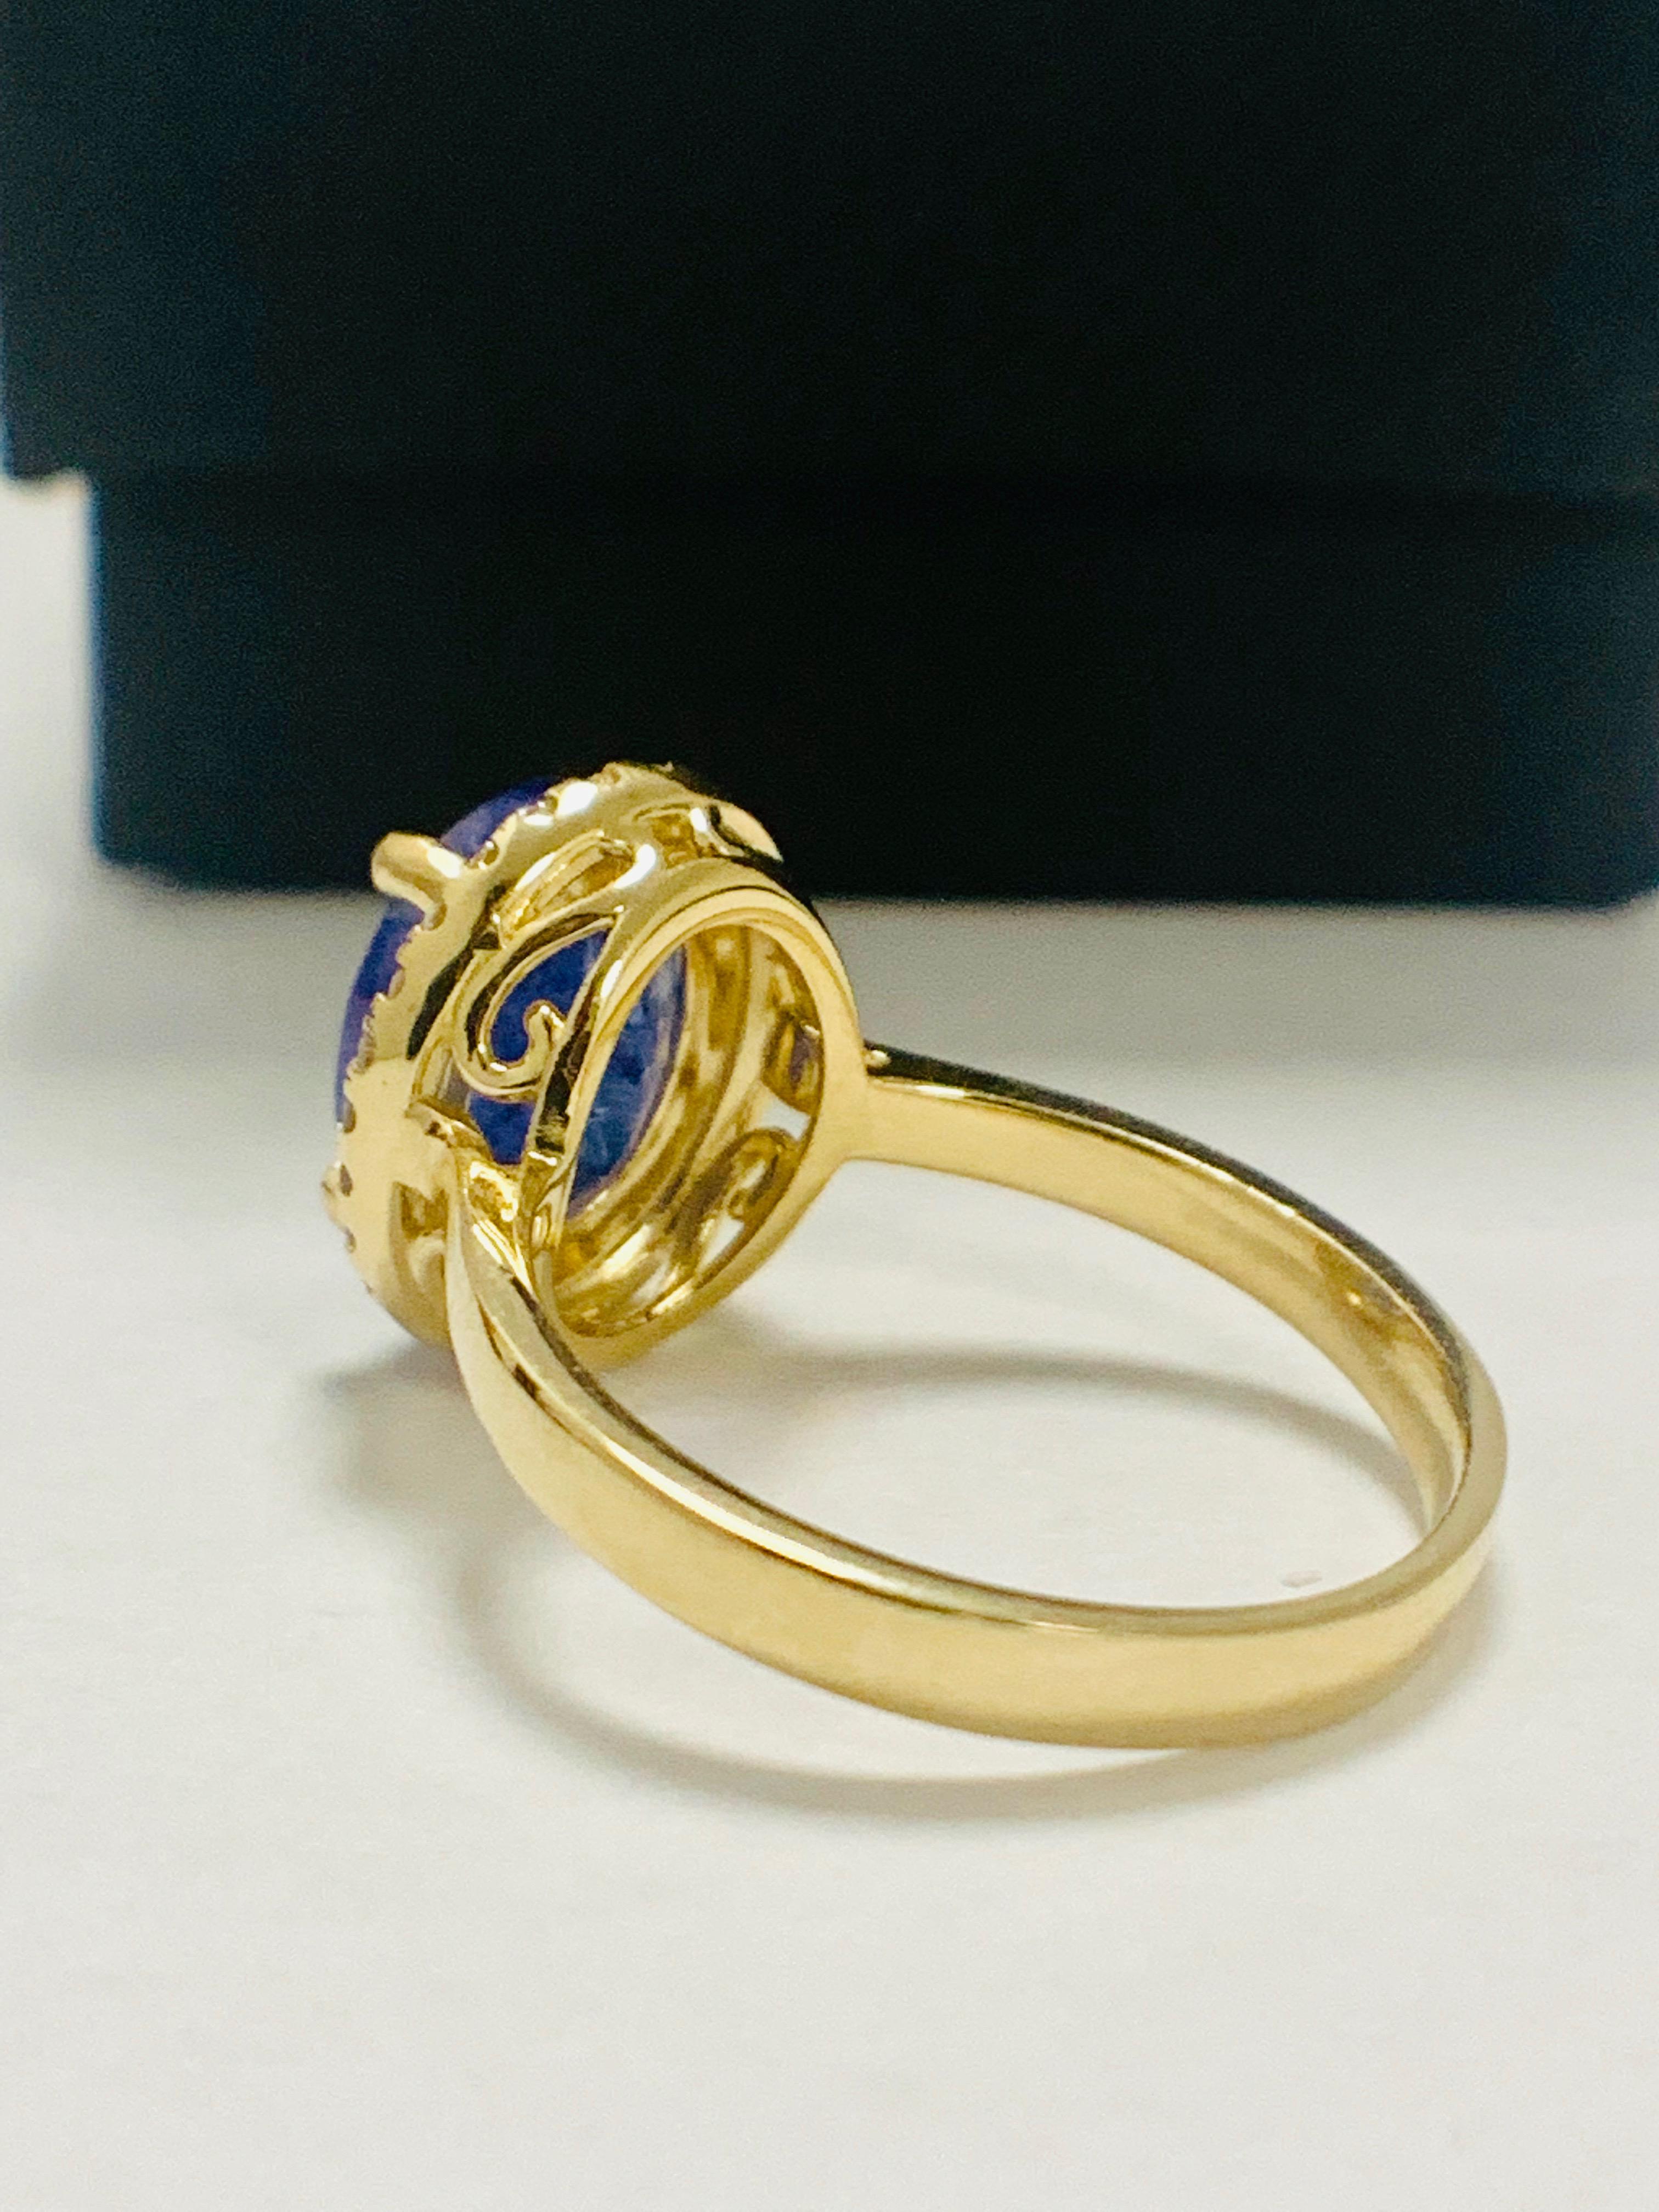 14ct Yellow Gold Tanzanite and Diamond ring - Image 5 of 13